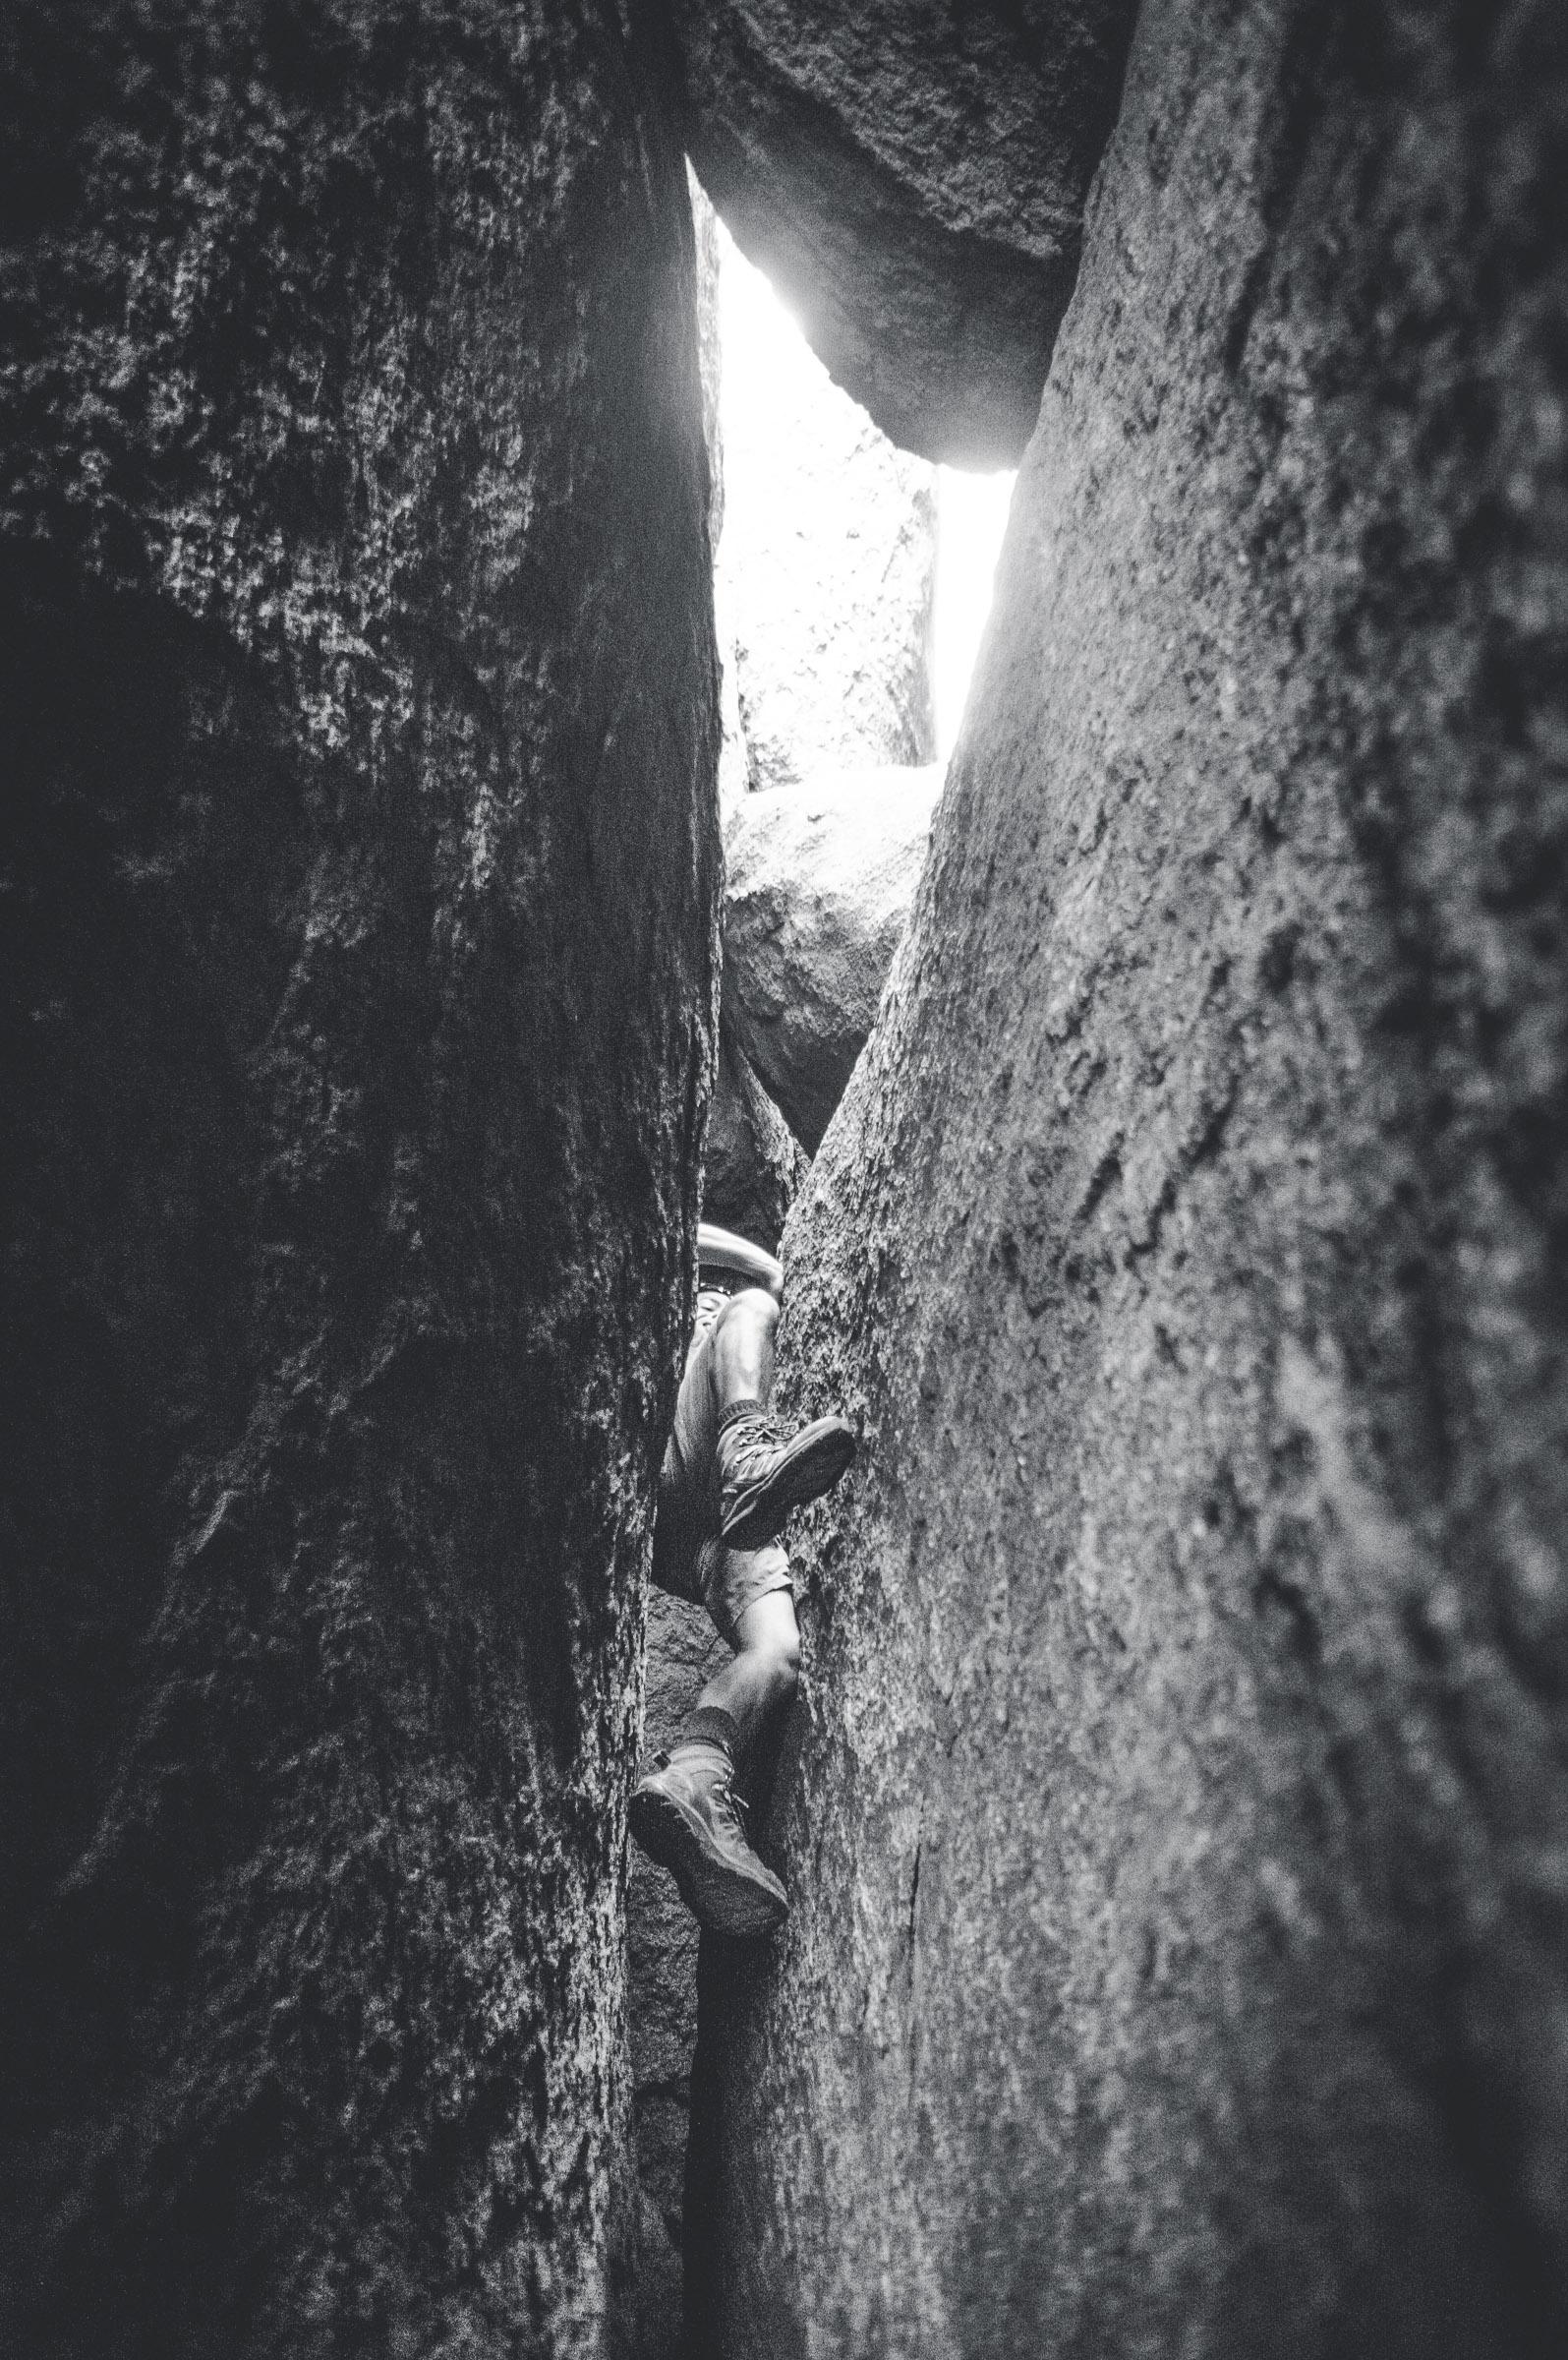 Spanish Cave 11-12-16 B&W (30 of 33).JPG